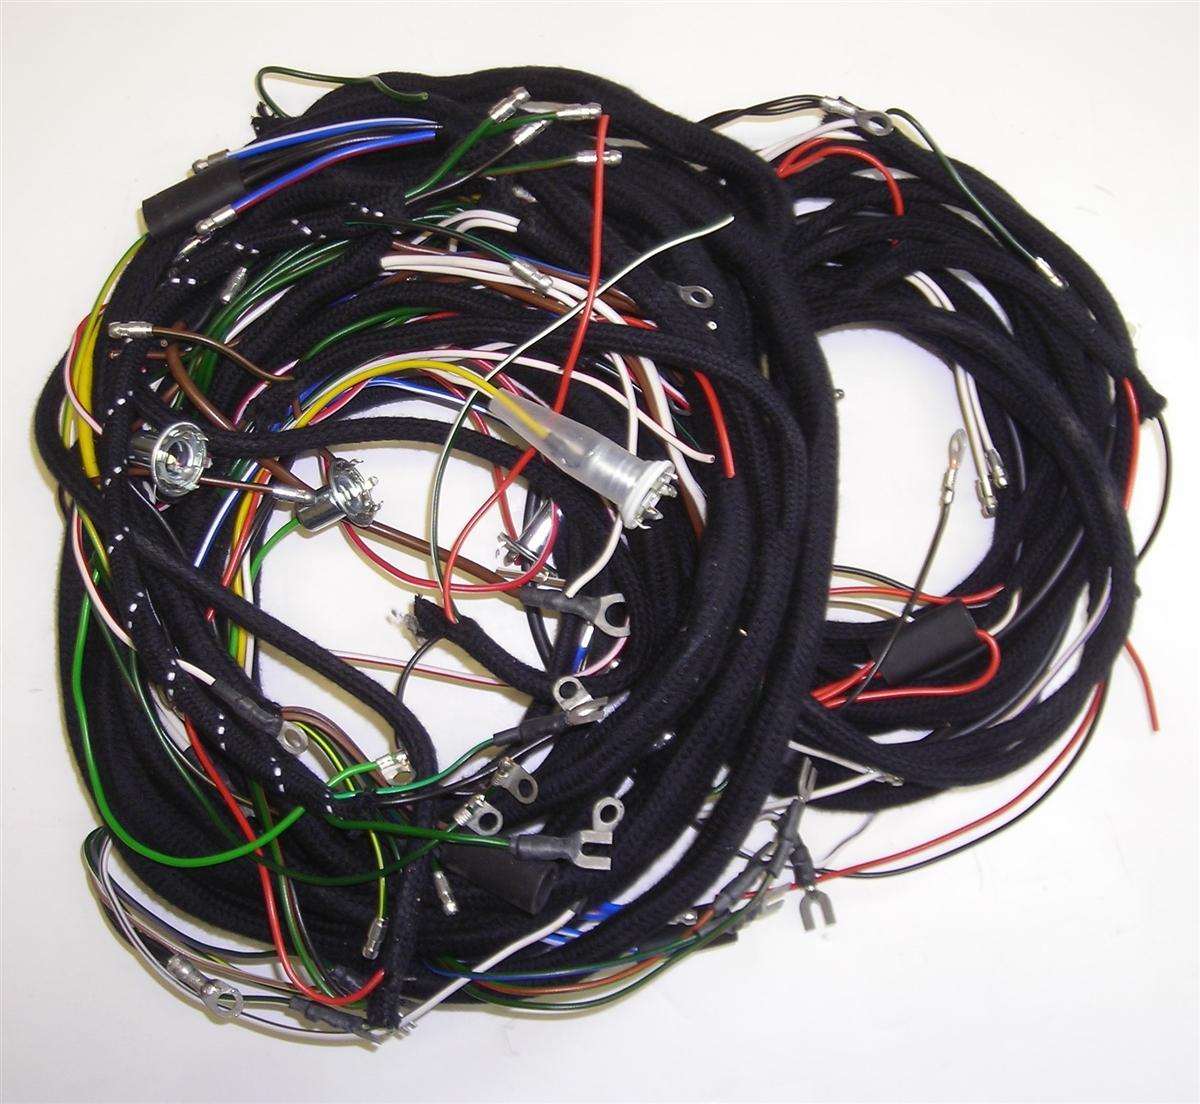 austin healey bn6 1958 harness set pvc cable  [ 1200 x 1104 Pixel ]